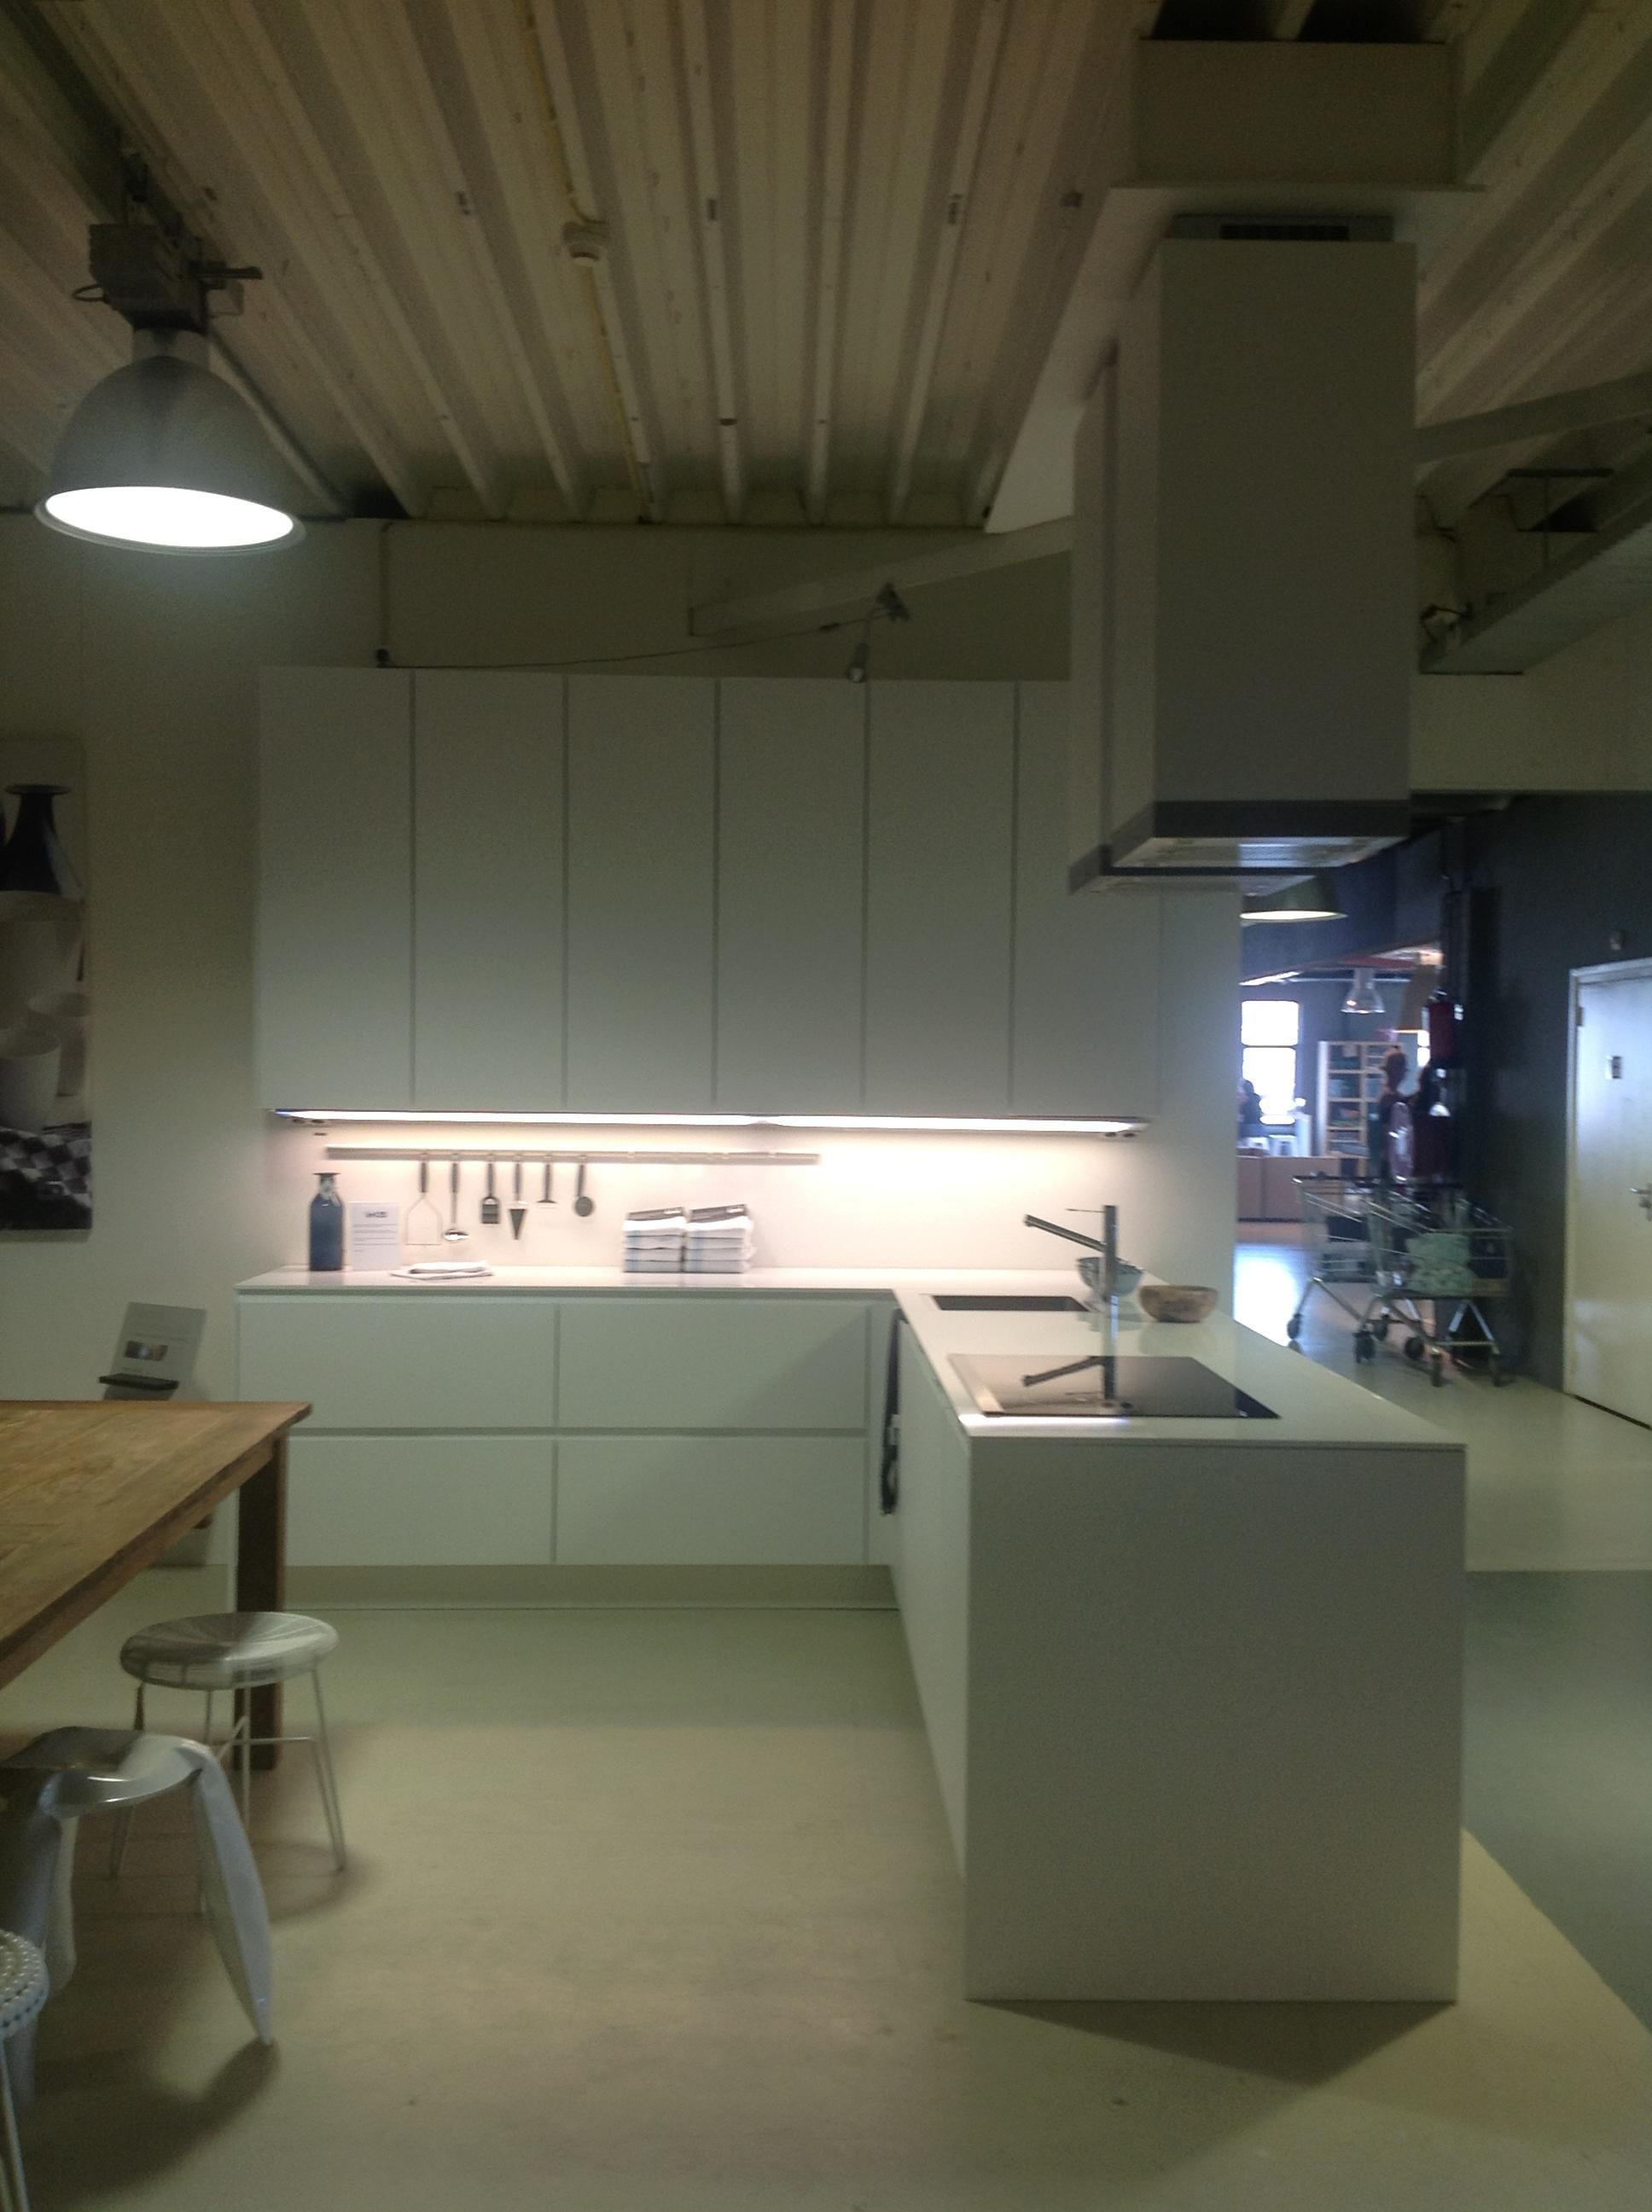 Siematic showroomkeukens siematic showroomkeuken aanbiedingen siematic luxe design greeploze - Keuken model amenagee ...